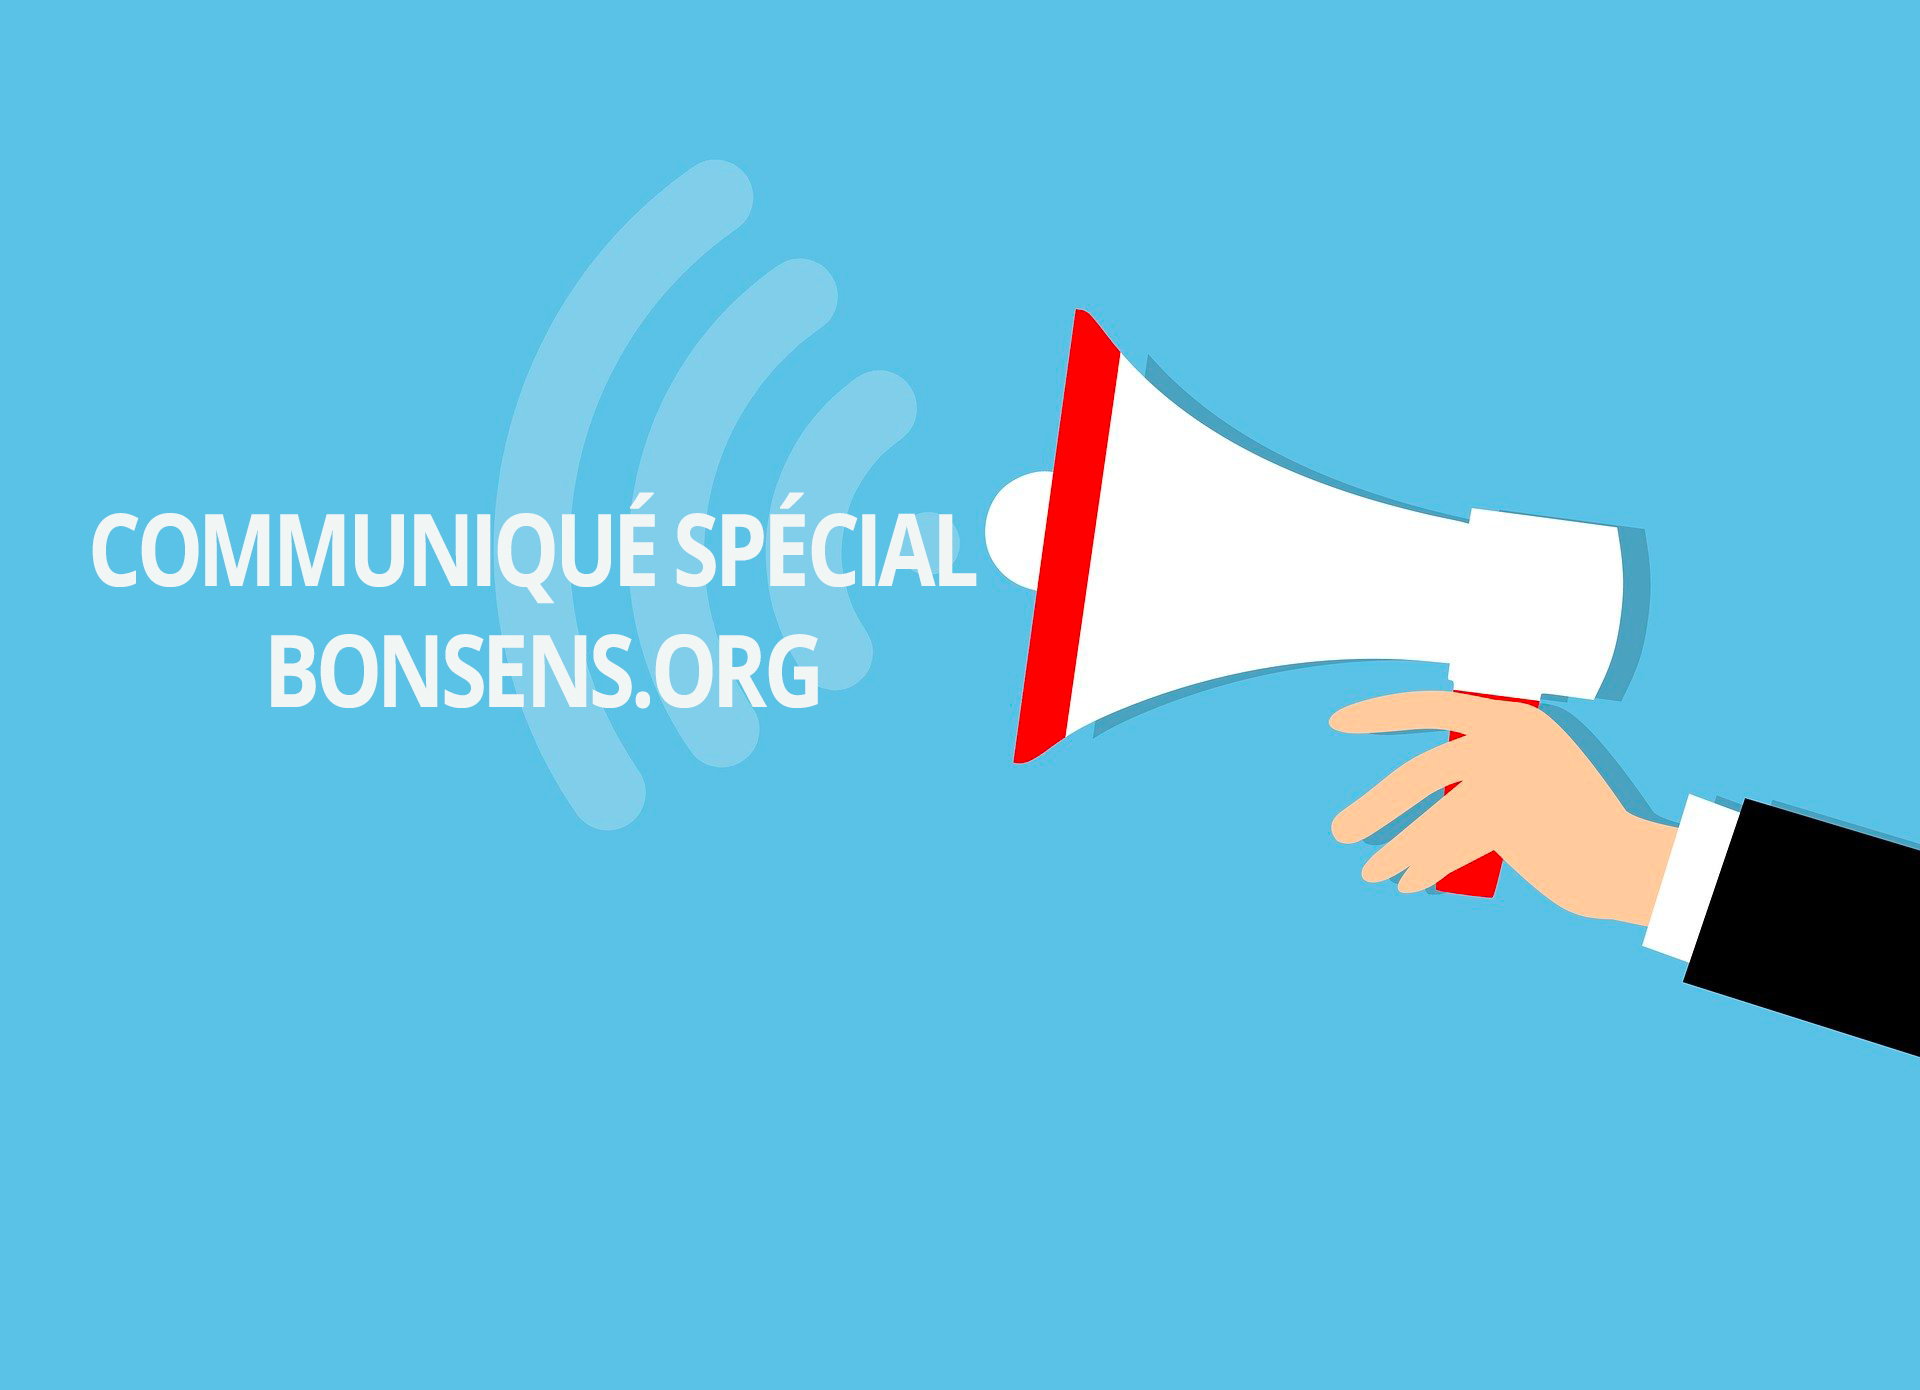 communique-special-bonsens